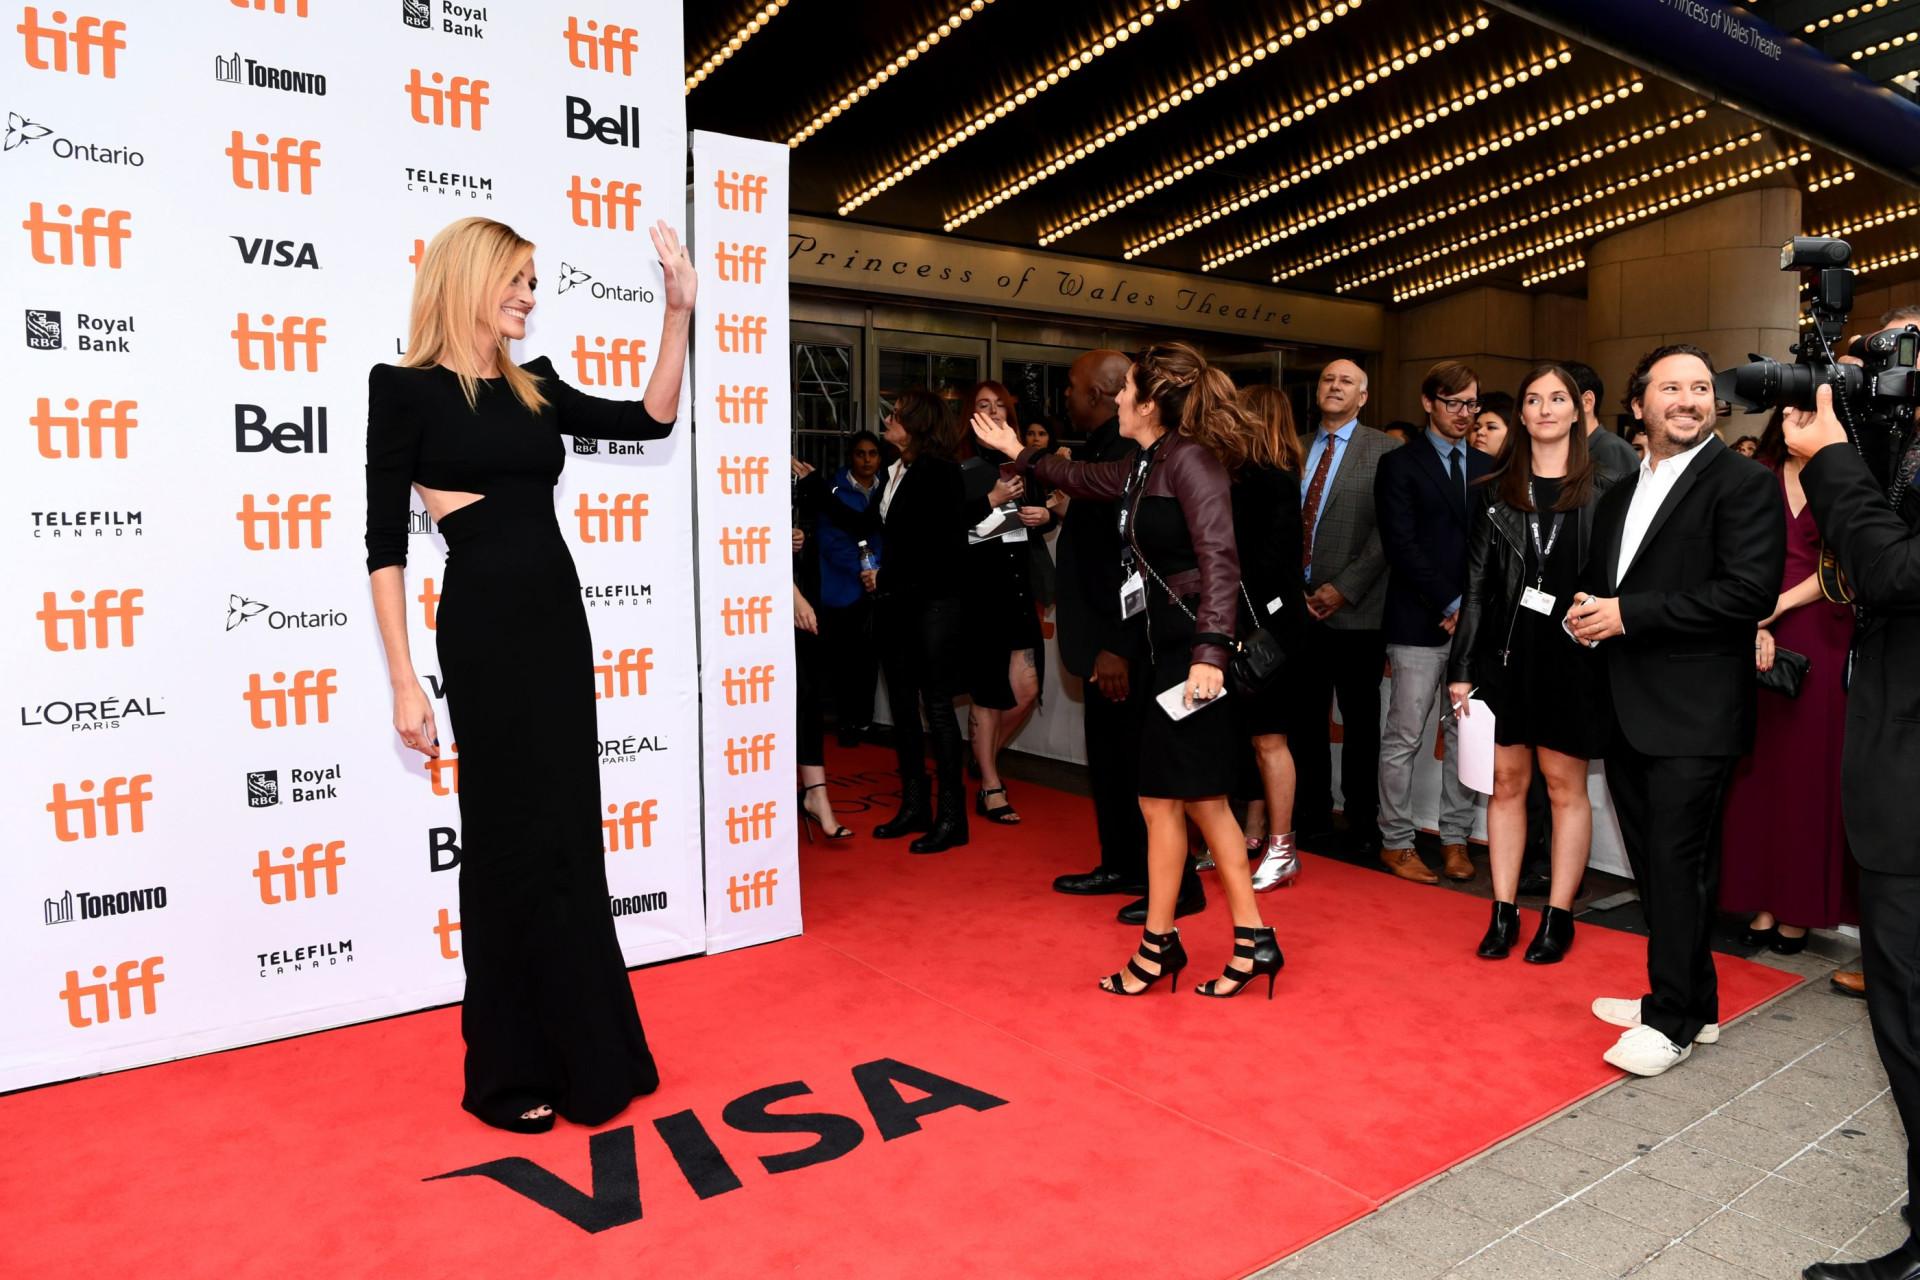 Amigo diz que Julia Roberts pesa 47 quilos. 'Vítima de Hollywood'